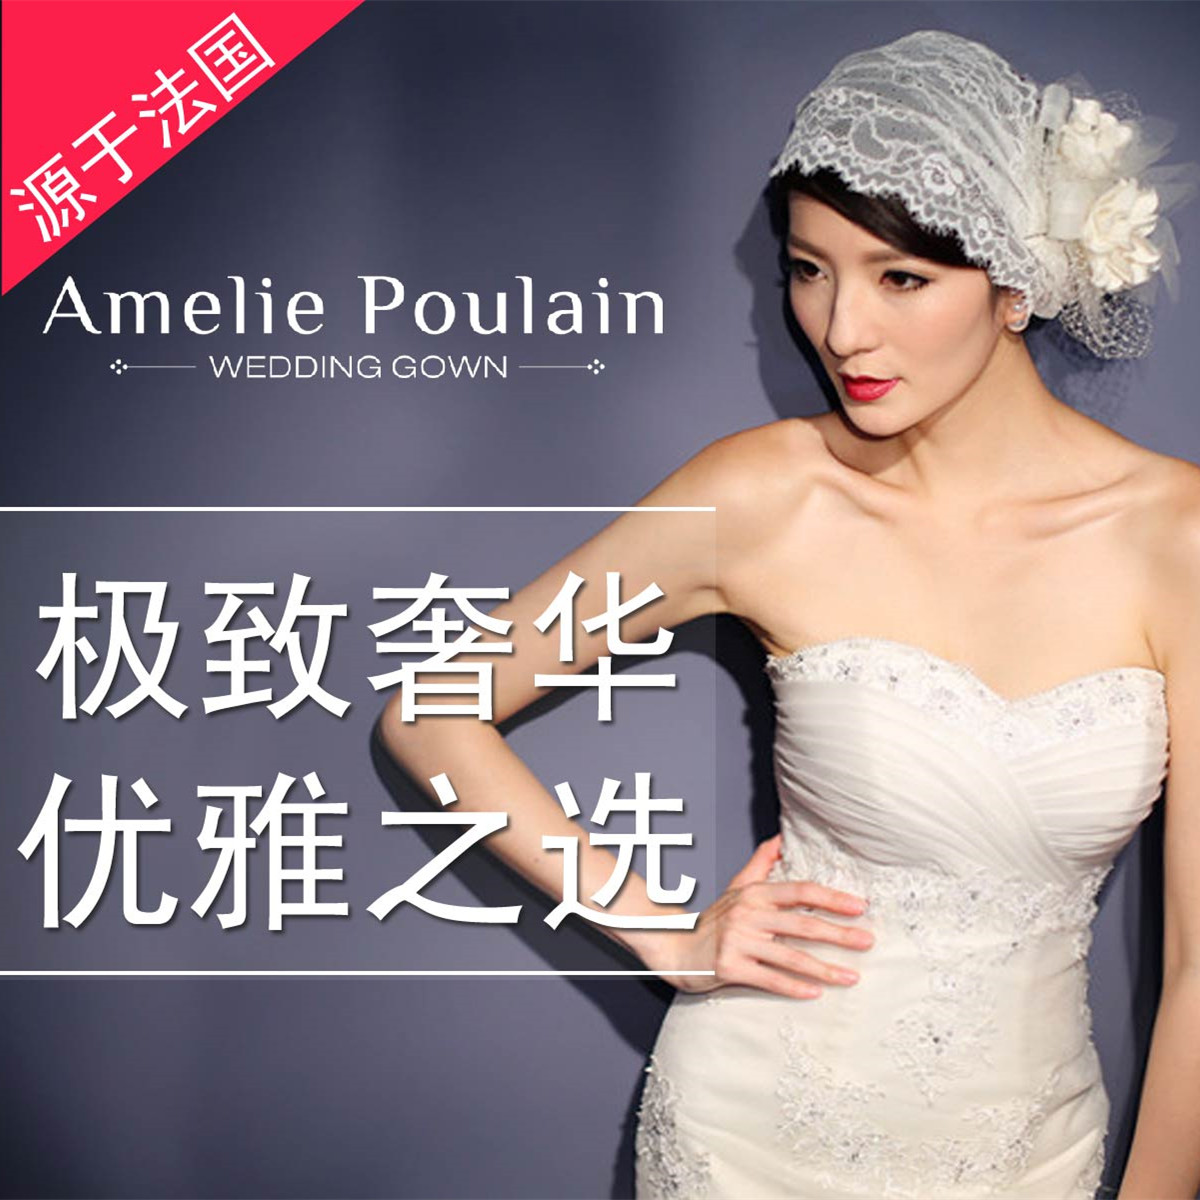 法国AMELIE POULAIN婚纱礼服